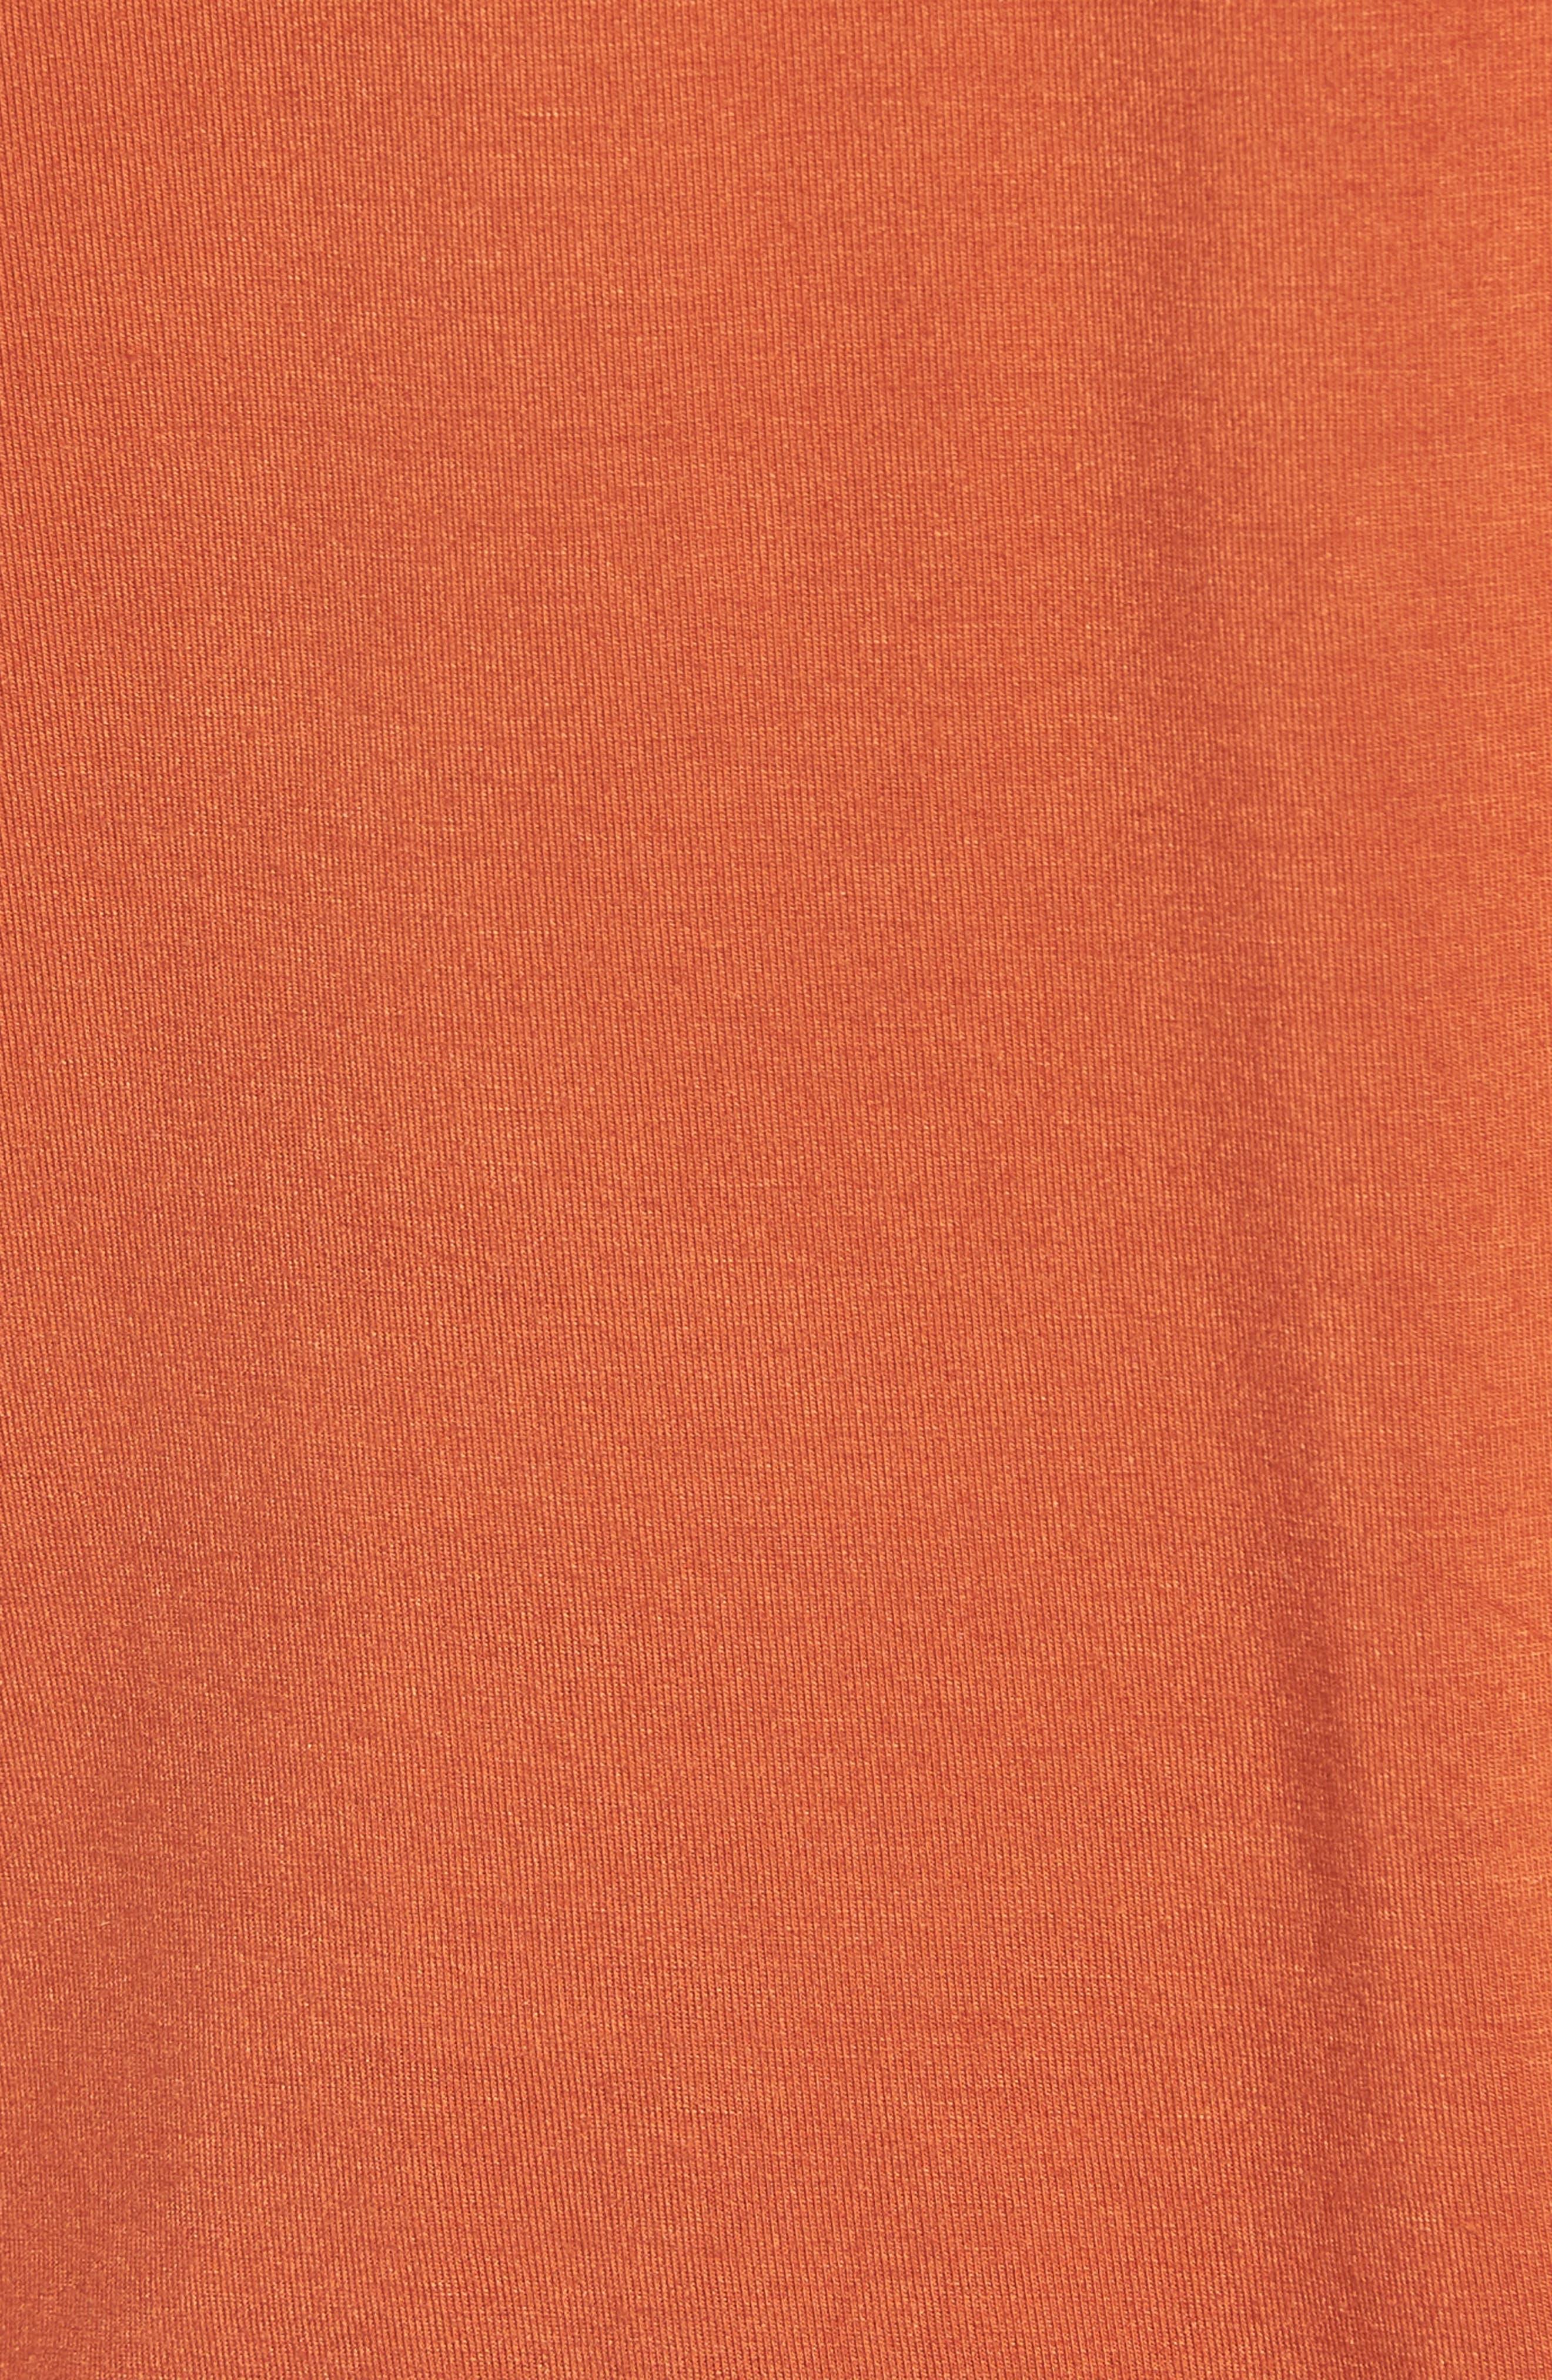 Summer Days & Double Plays Tee,                             Alternate thumbnail 6, color,                             Orange